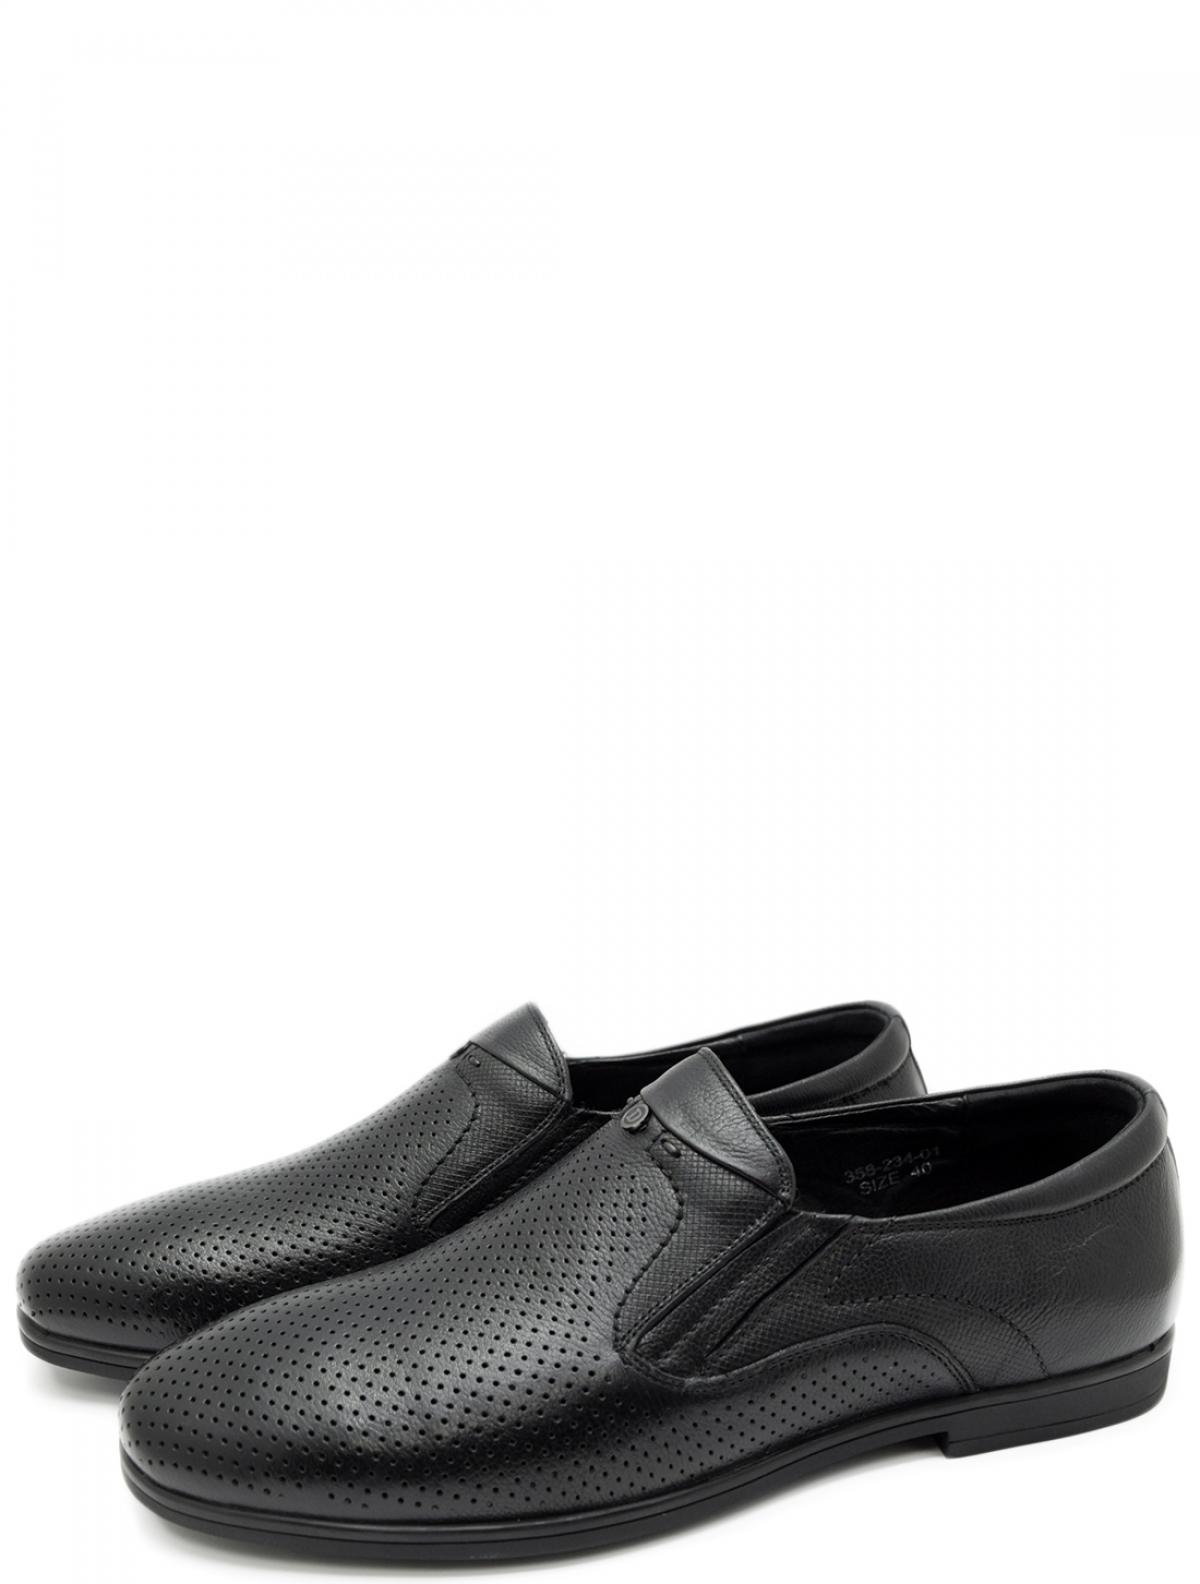 Dino Ricci Select 358-234-01 мужские туфли